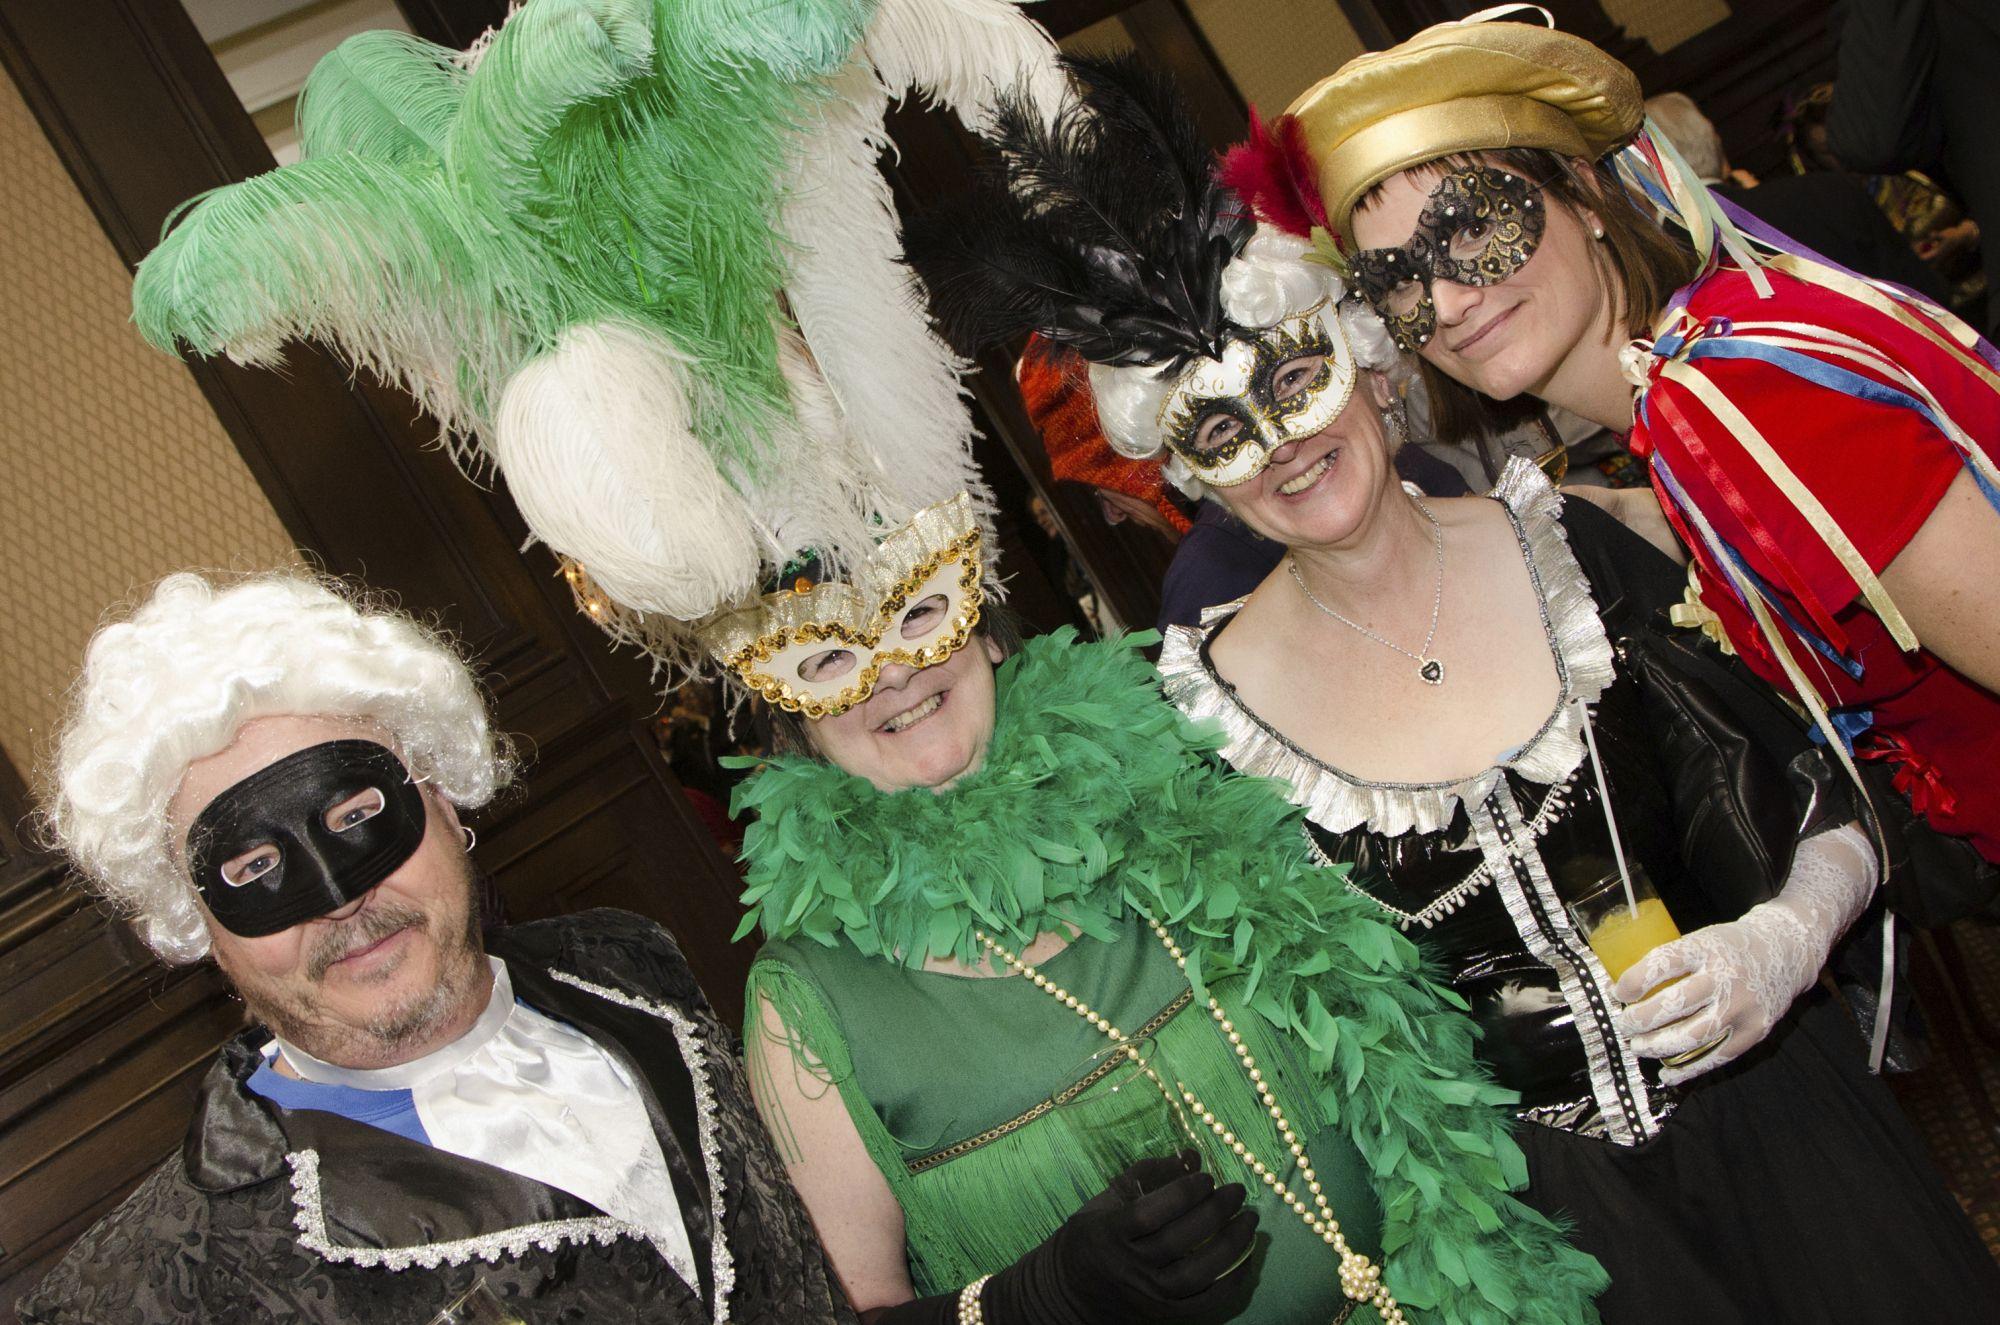 Best 2014 Halloween Parties For Adults In Metro Detroit